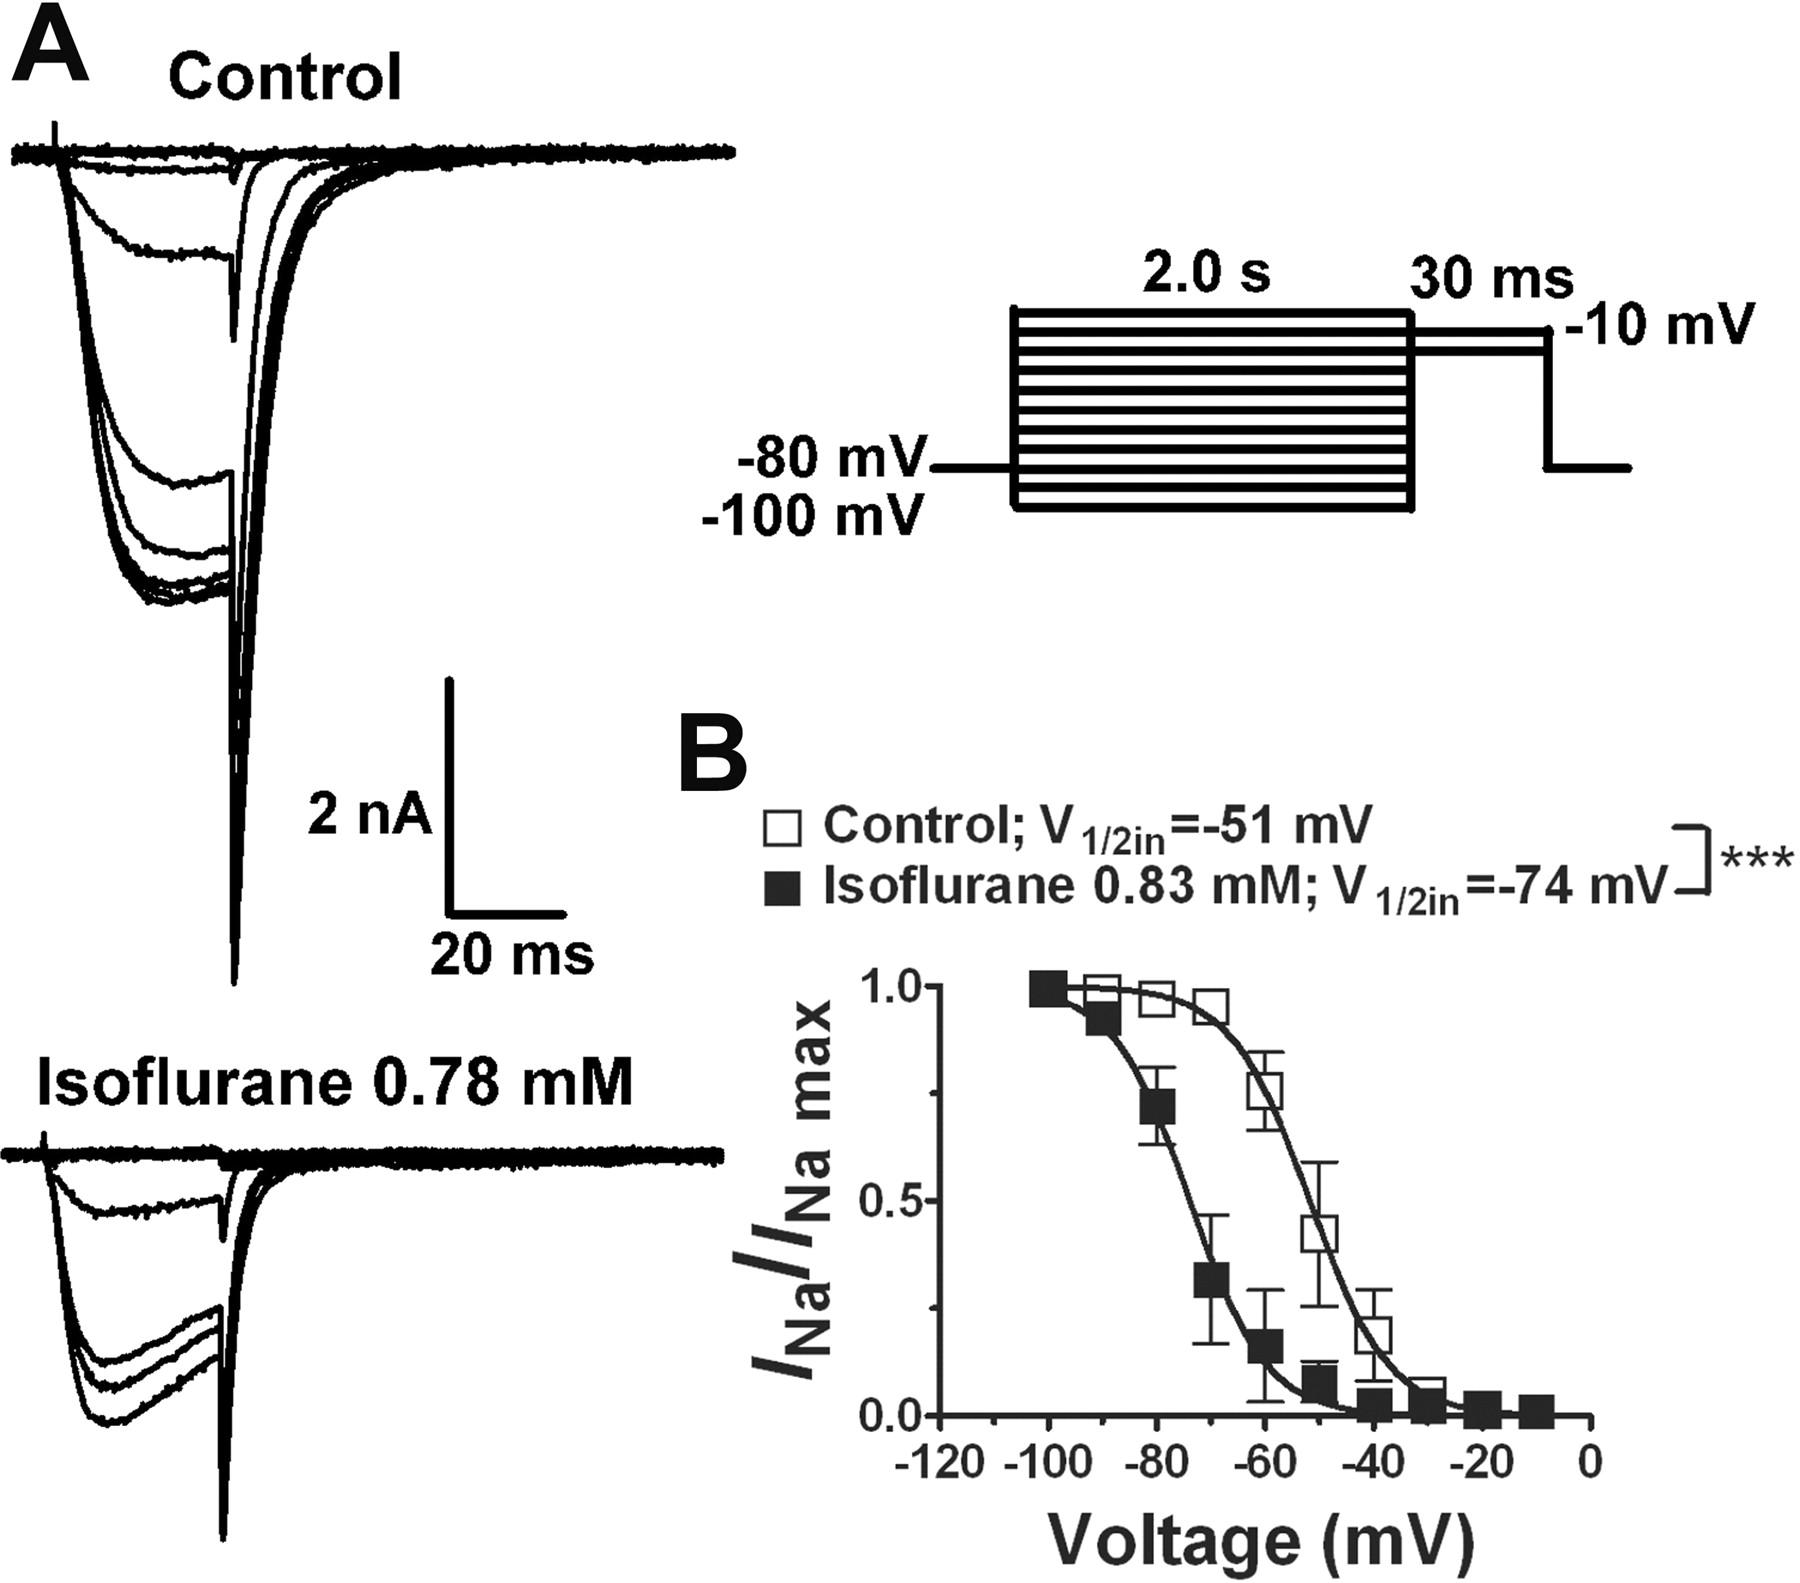 Isoflurane Inhibits Nachbac A Prokaryotic Voltage Gated Sodium Channel